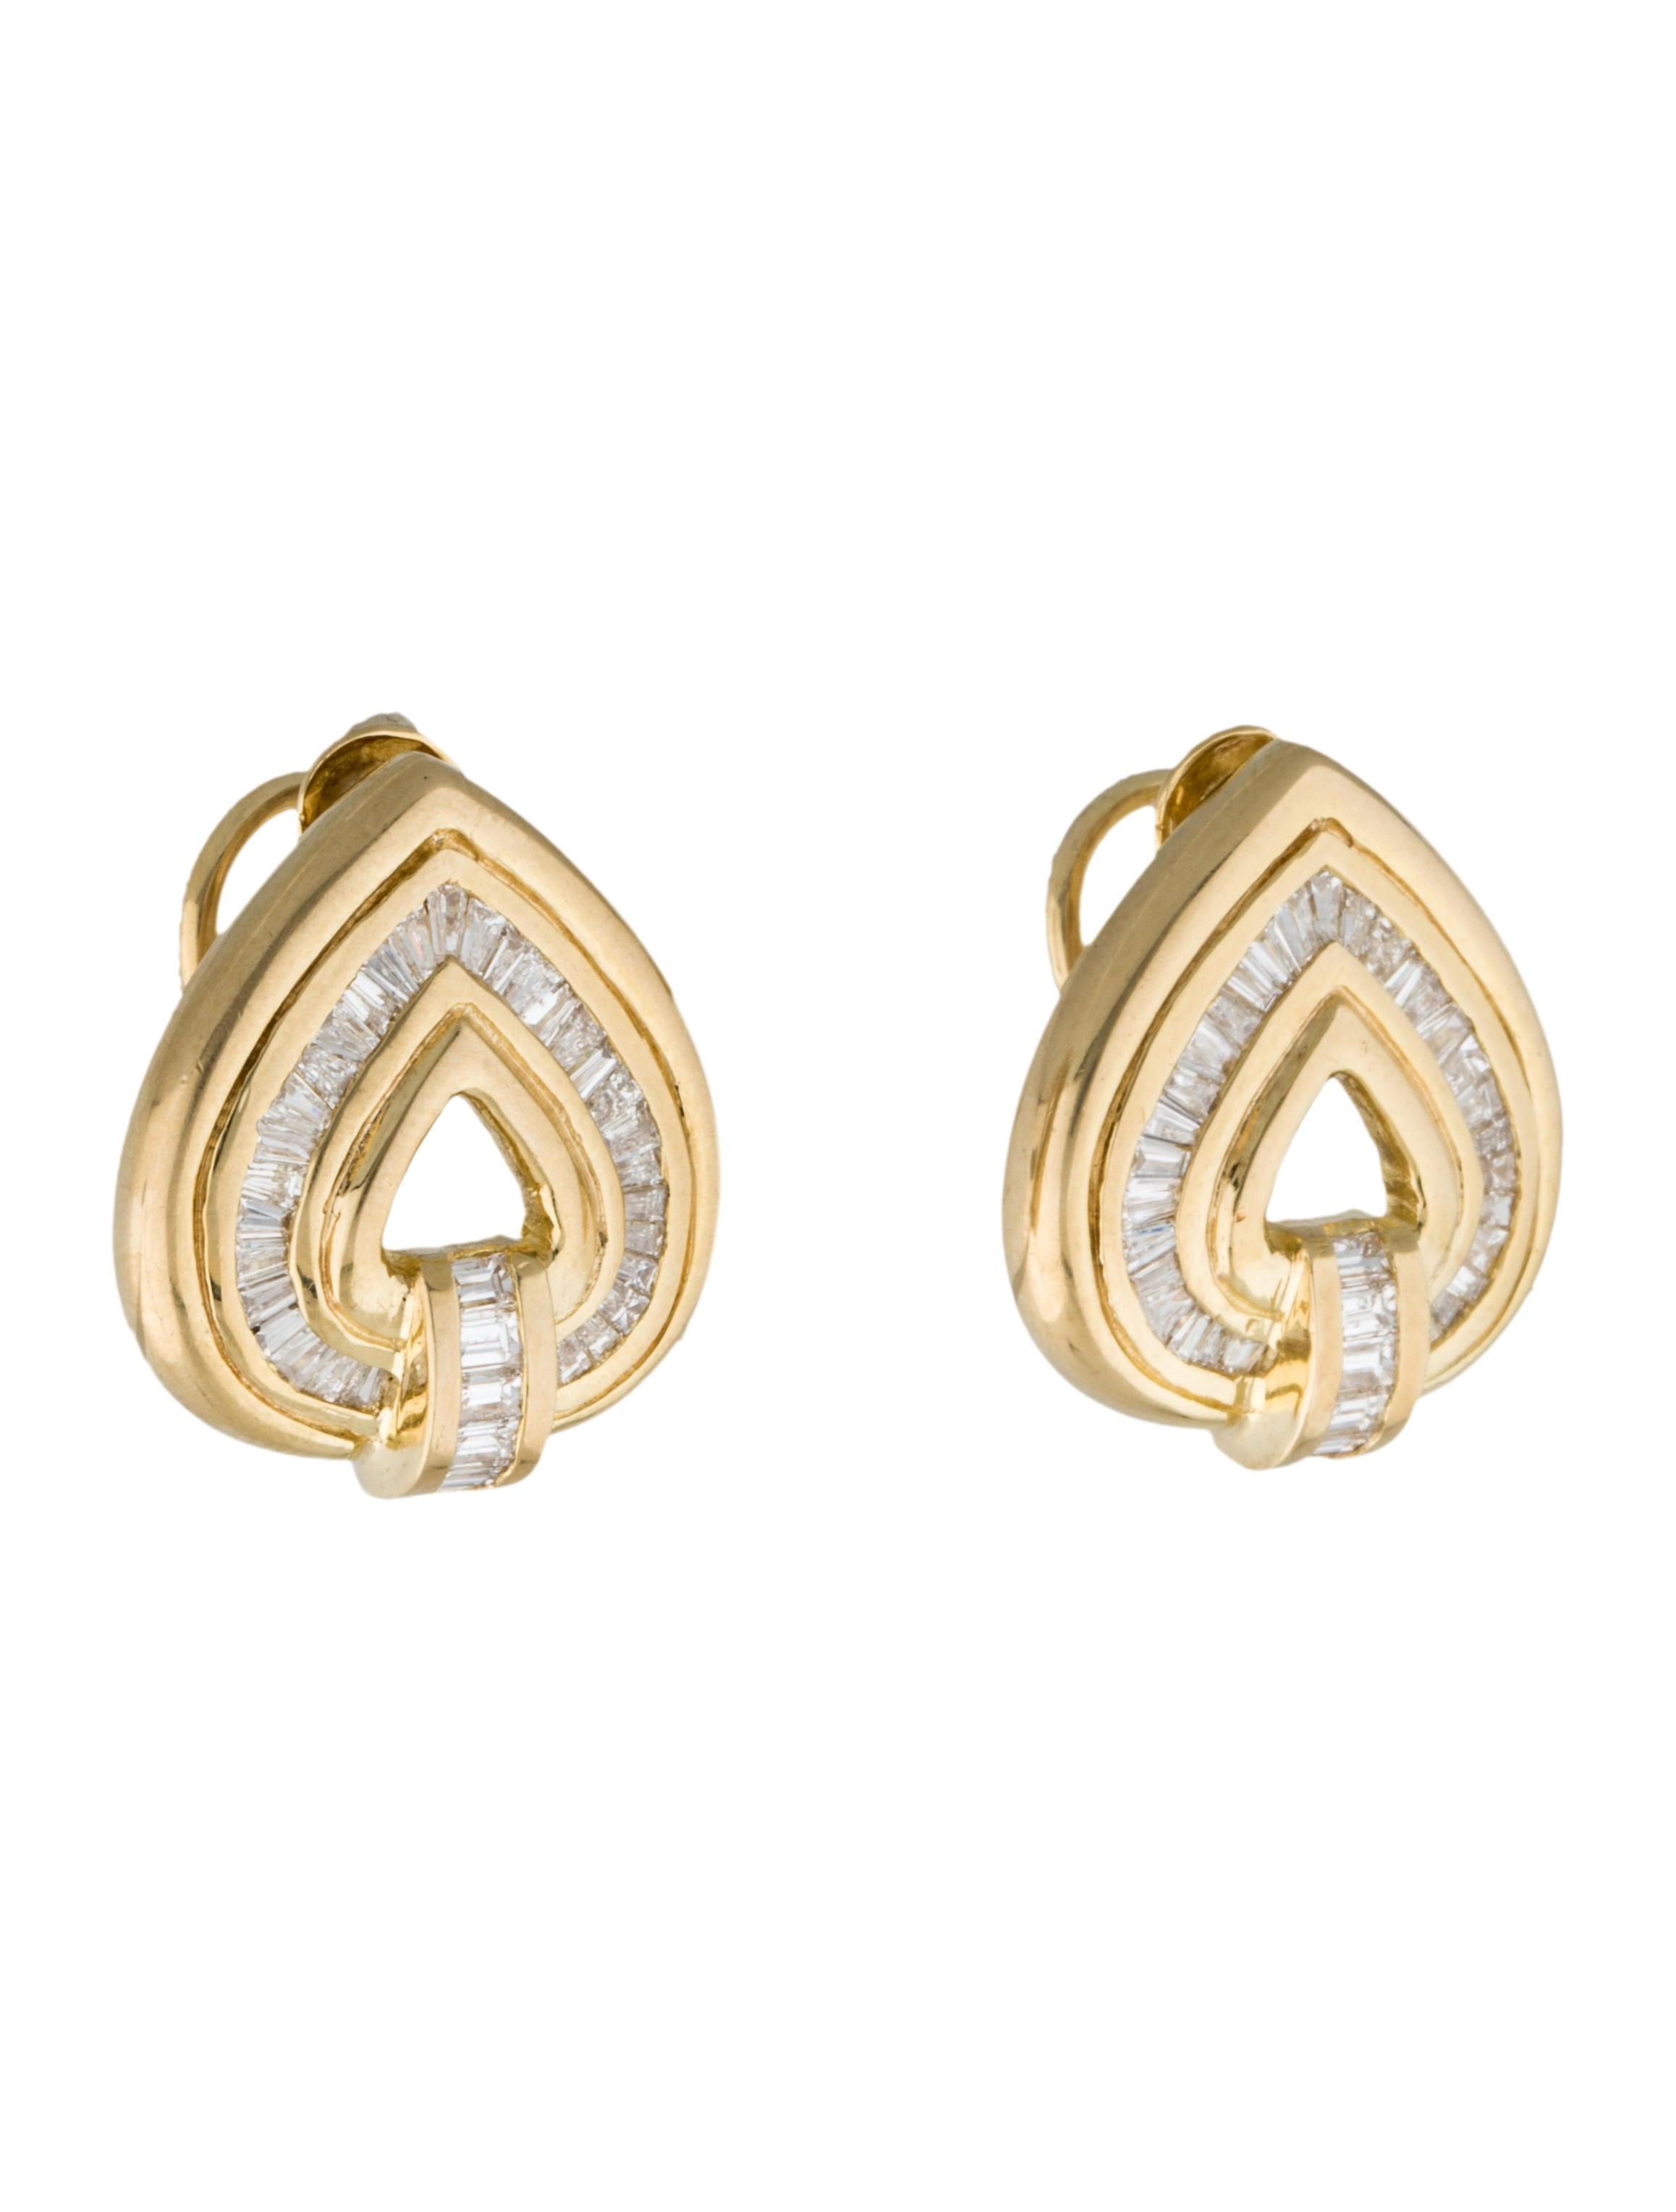 clip on earrings earrings fje27767 the realreal